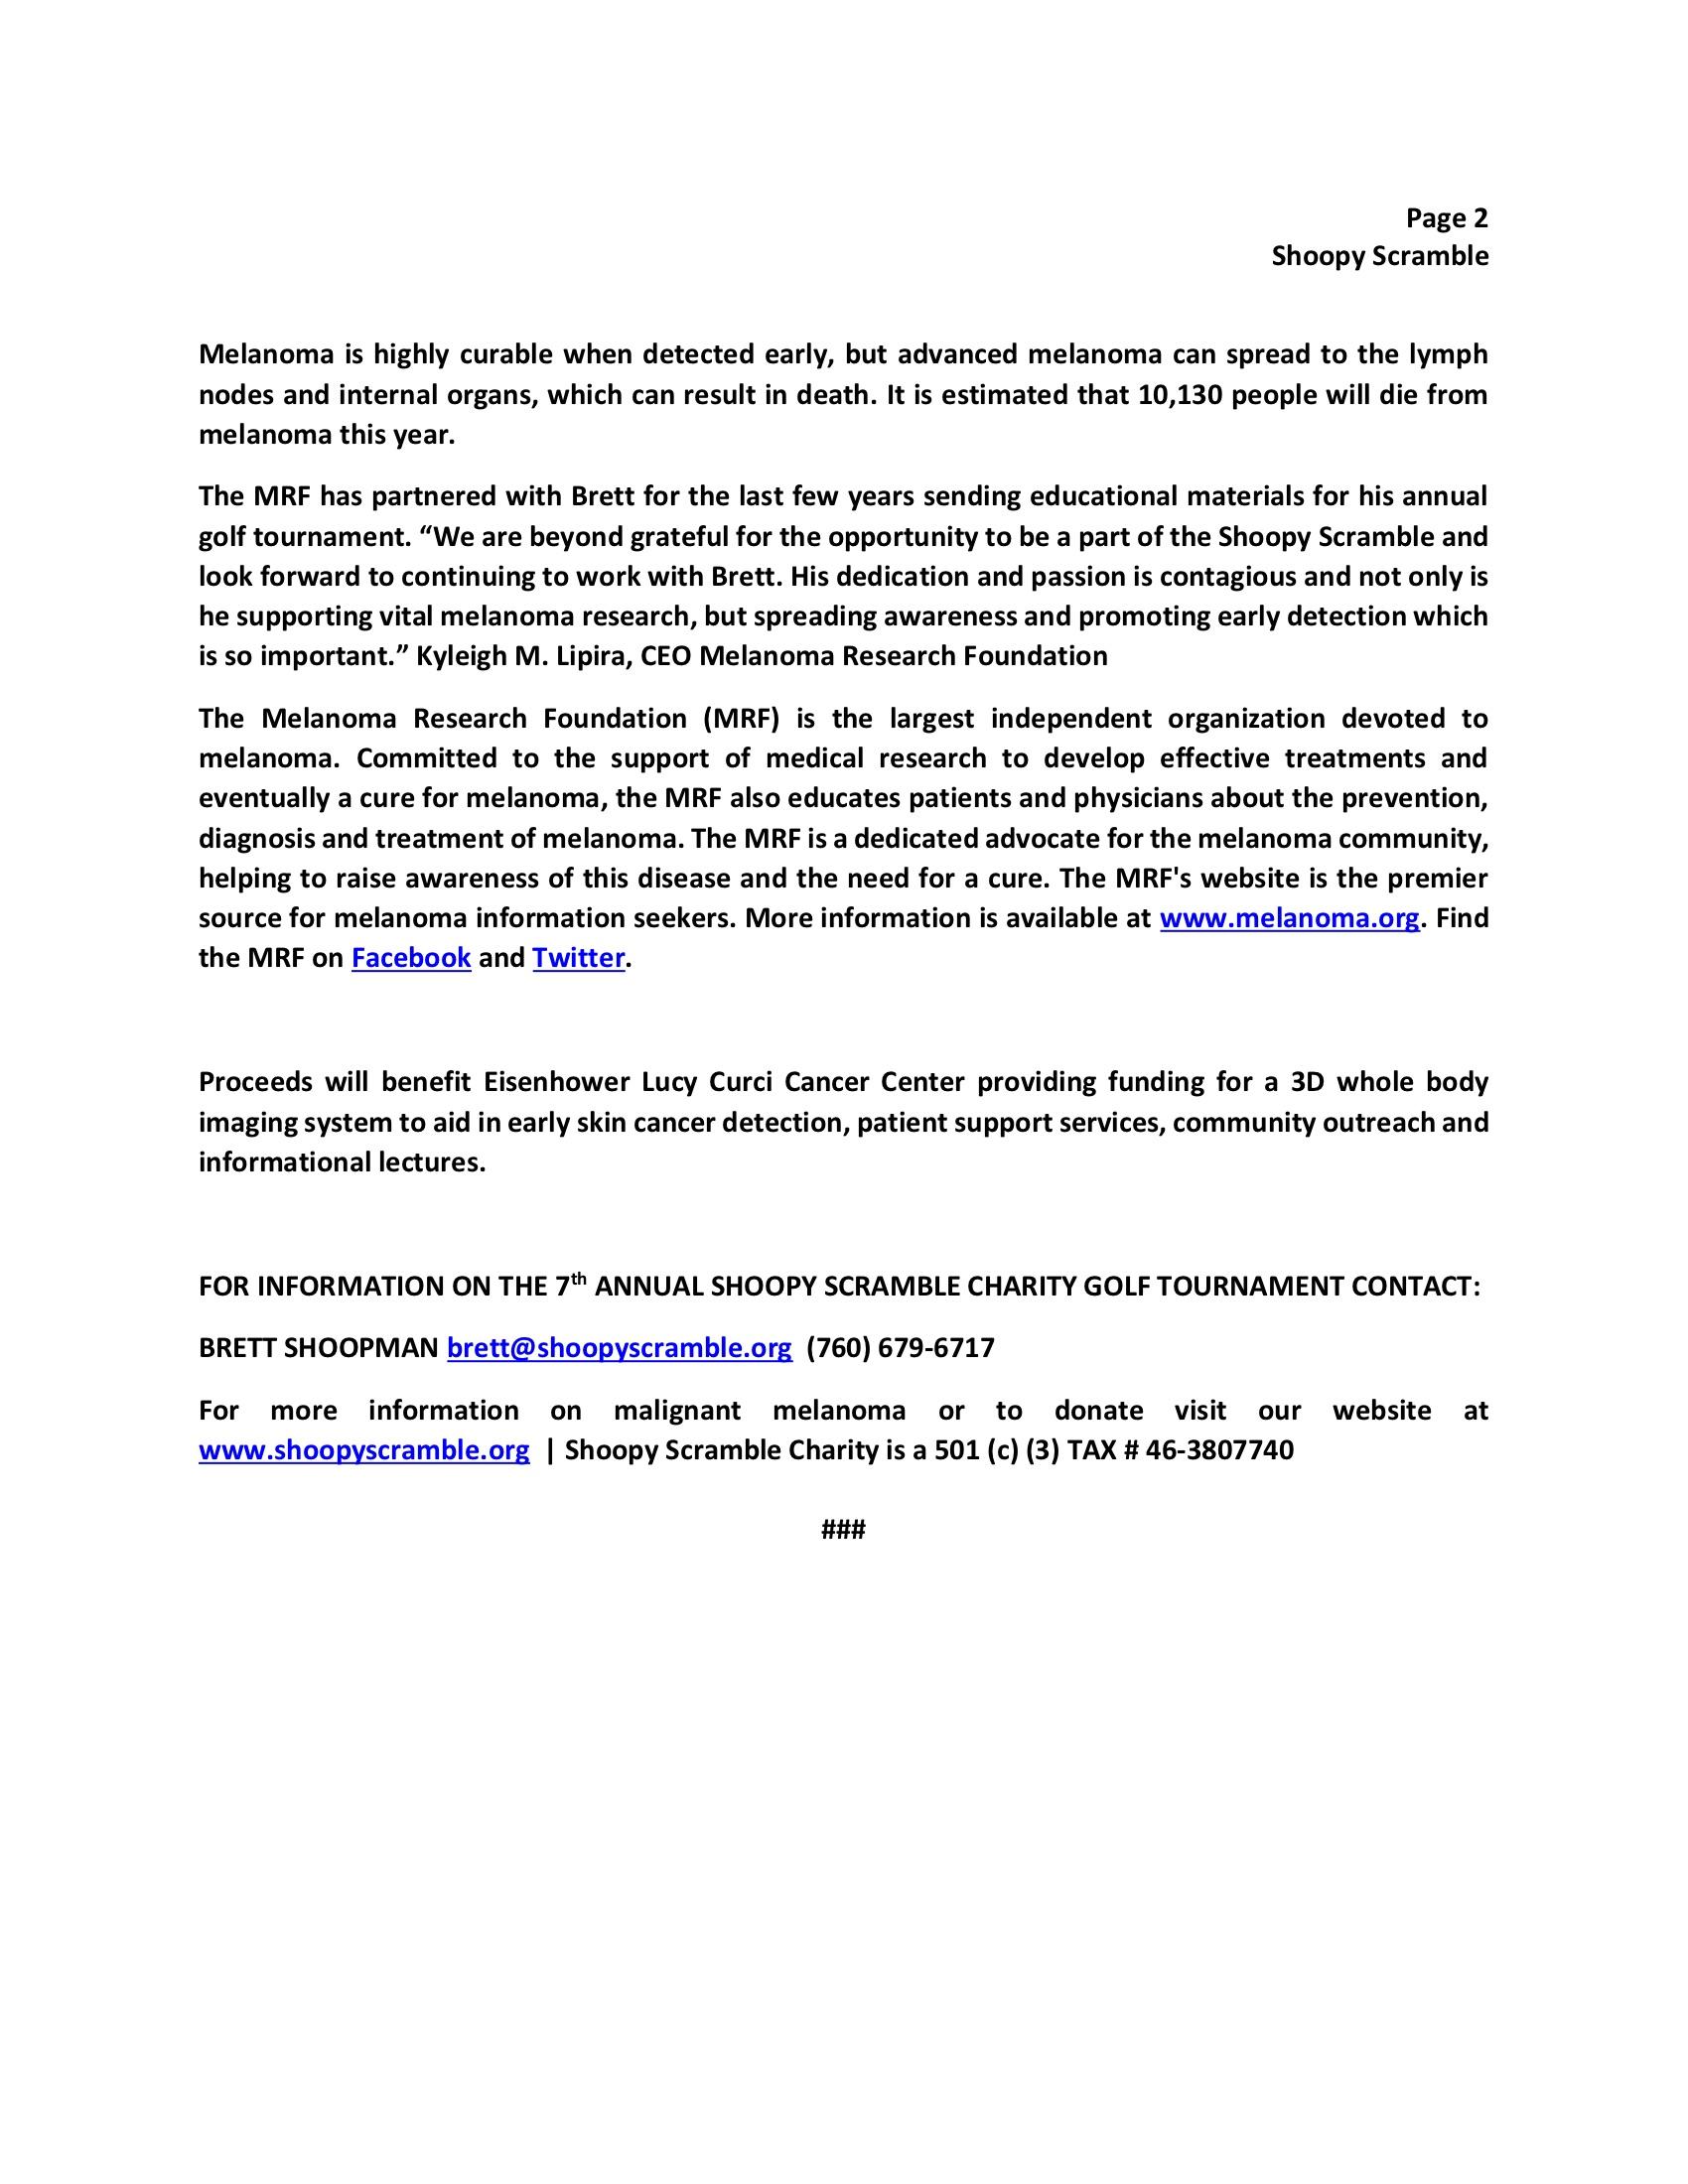 SHOOPY SCRAMBLE Press Release 2019 Final 4-222